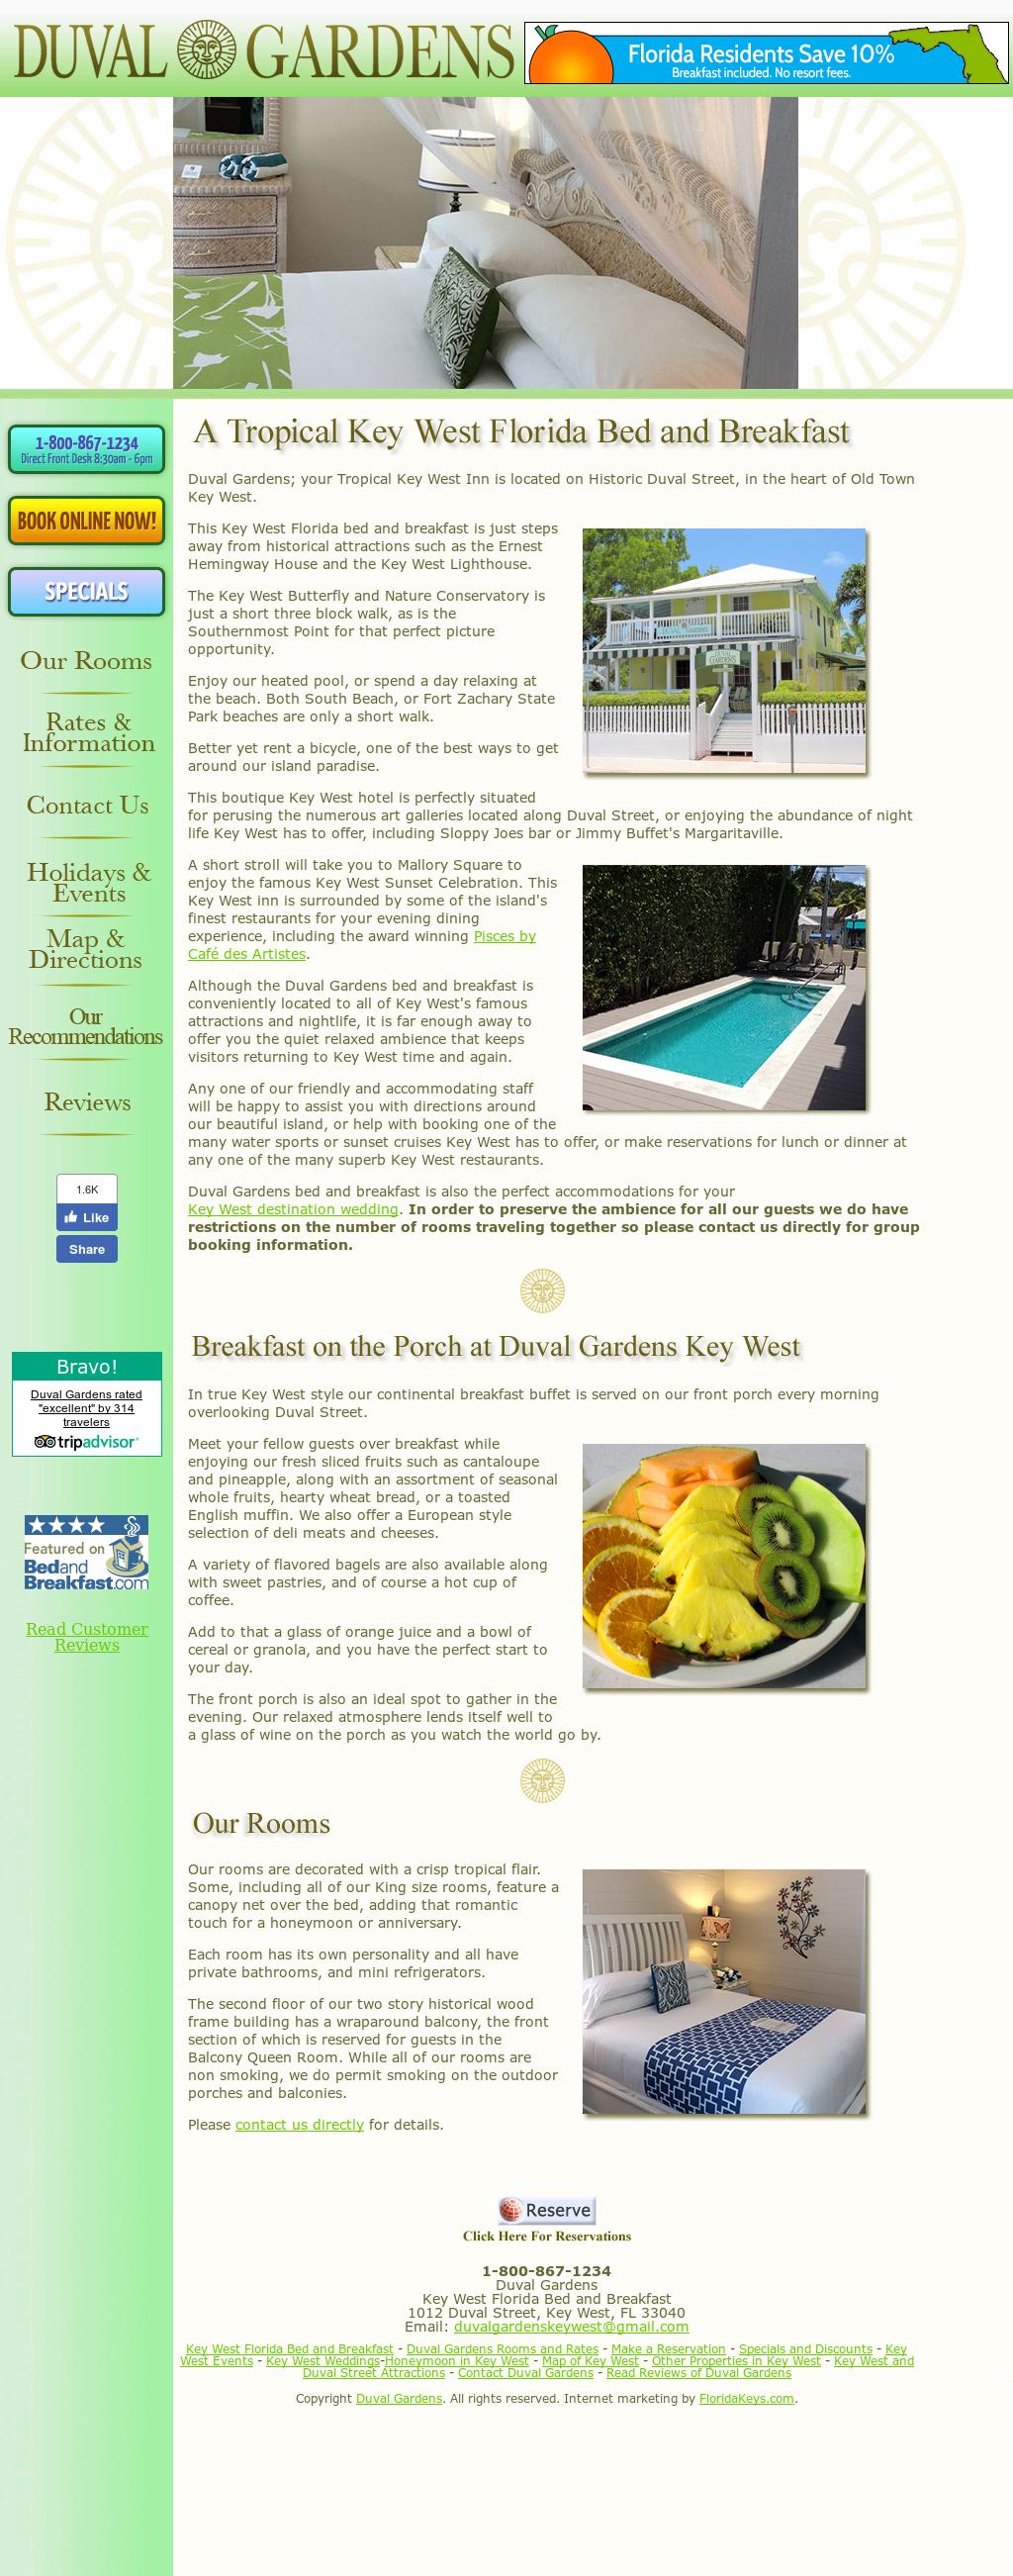 Duval Gardens Website History